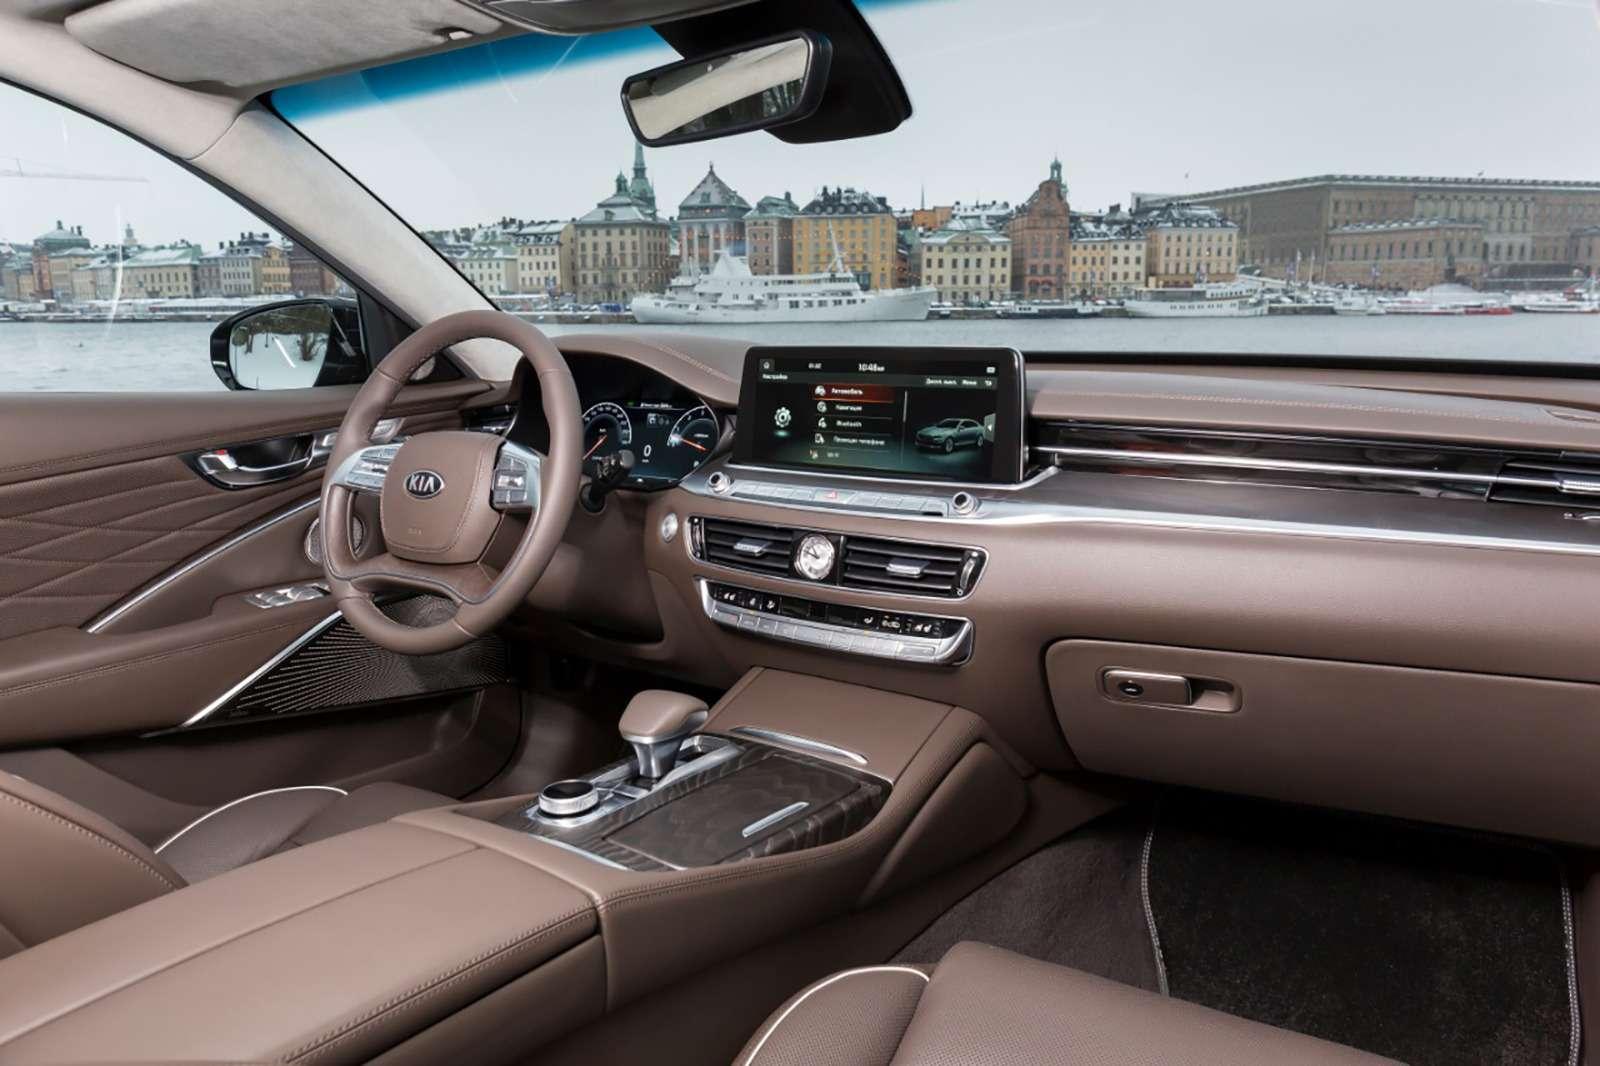 Kiaназвала российские цены нафлагманский седан K900— фото 946141